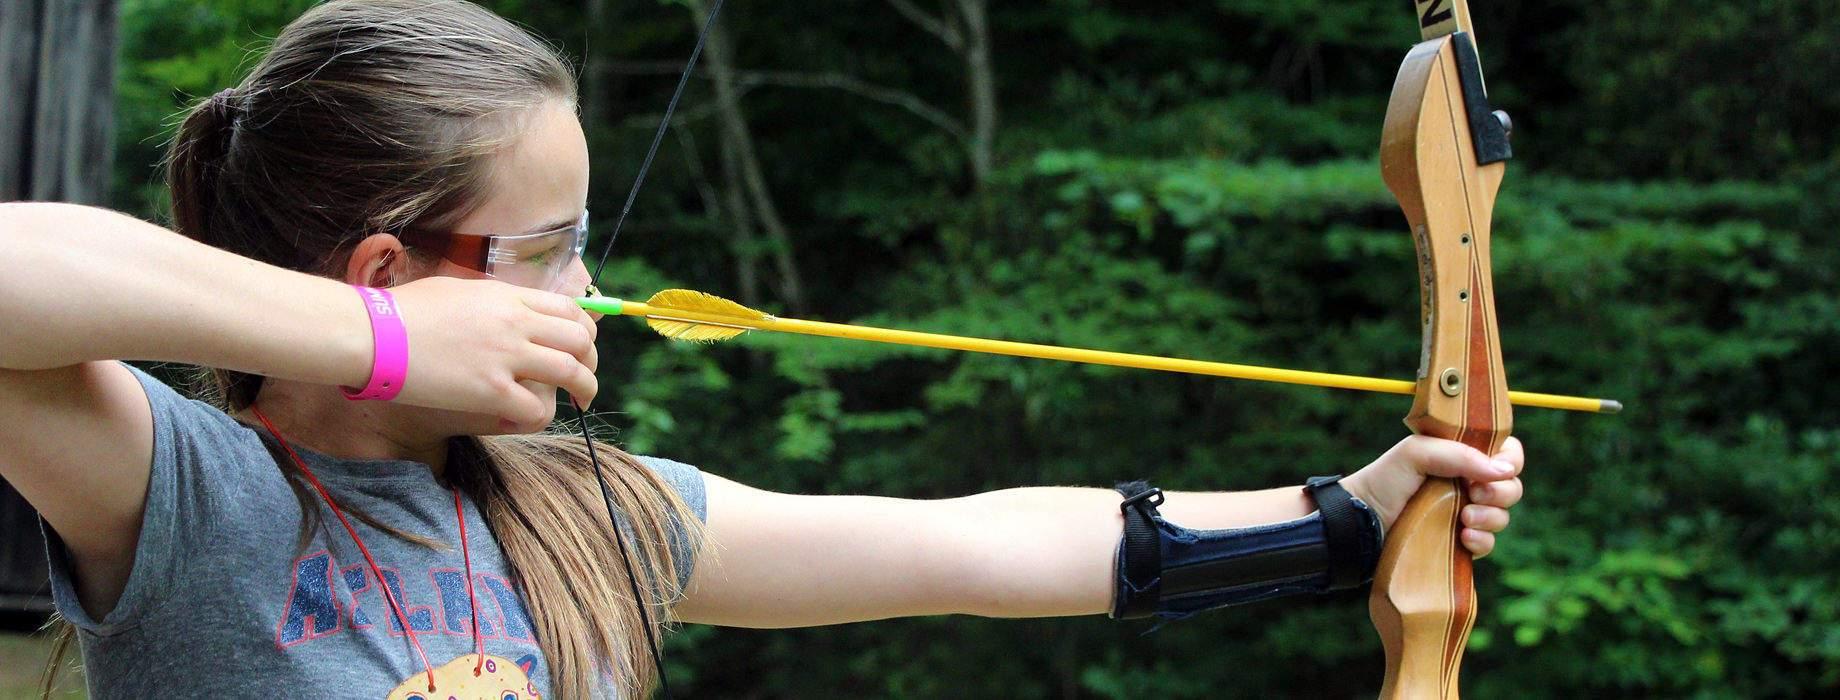 sport-camps-archery